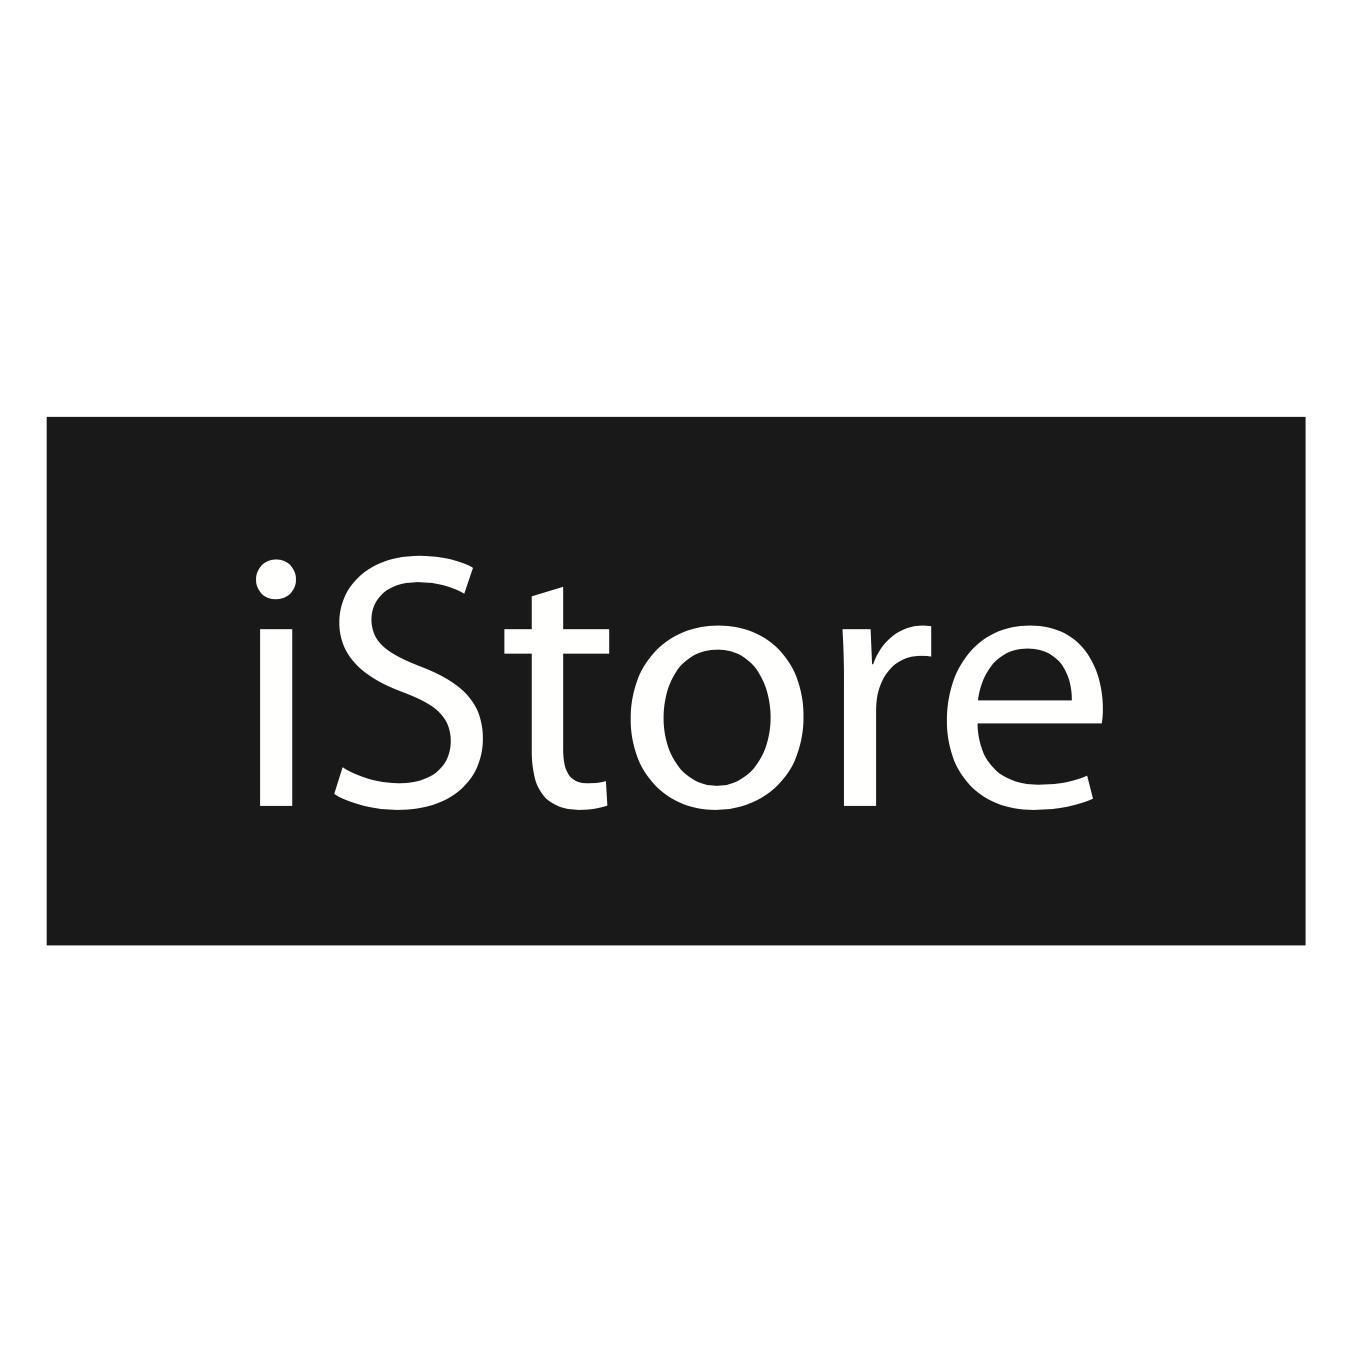 Top10 iPhone accessories